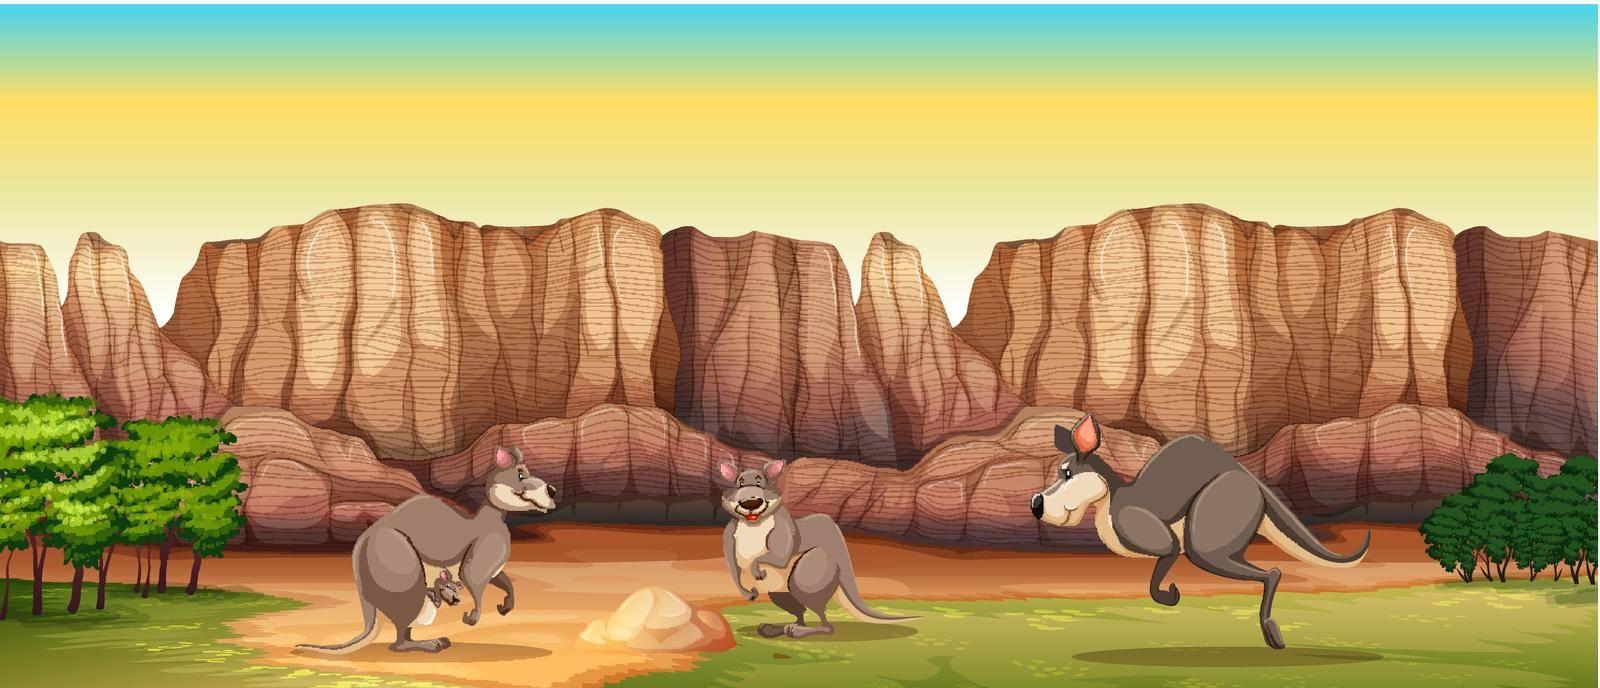 Three kangaroo stading in a field